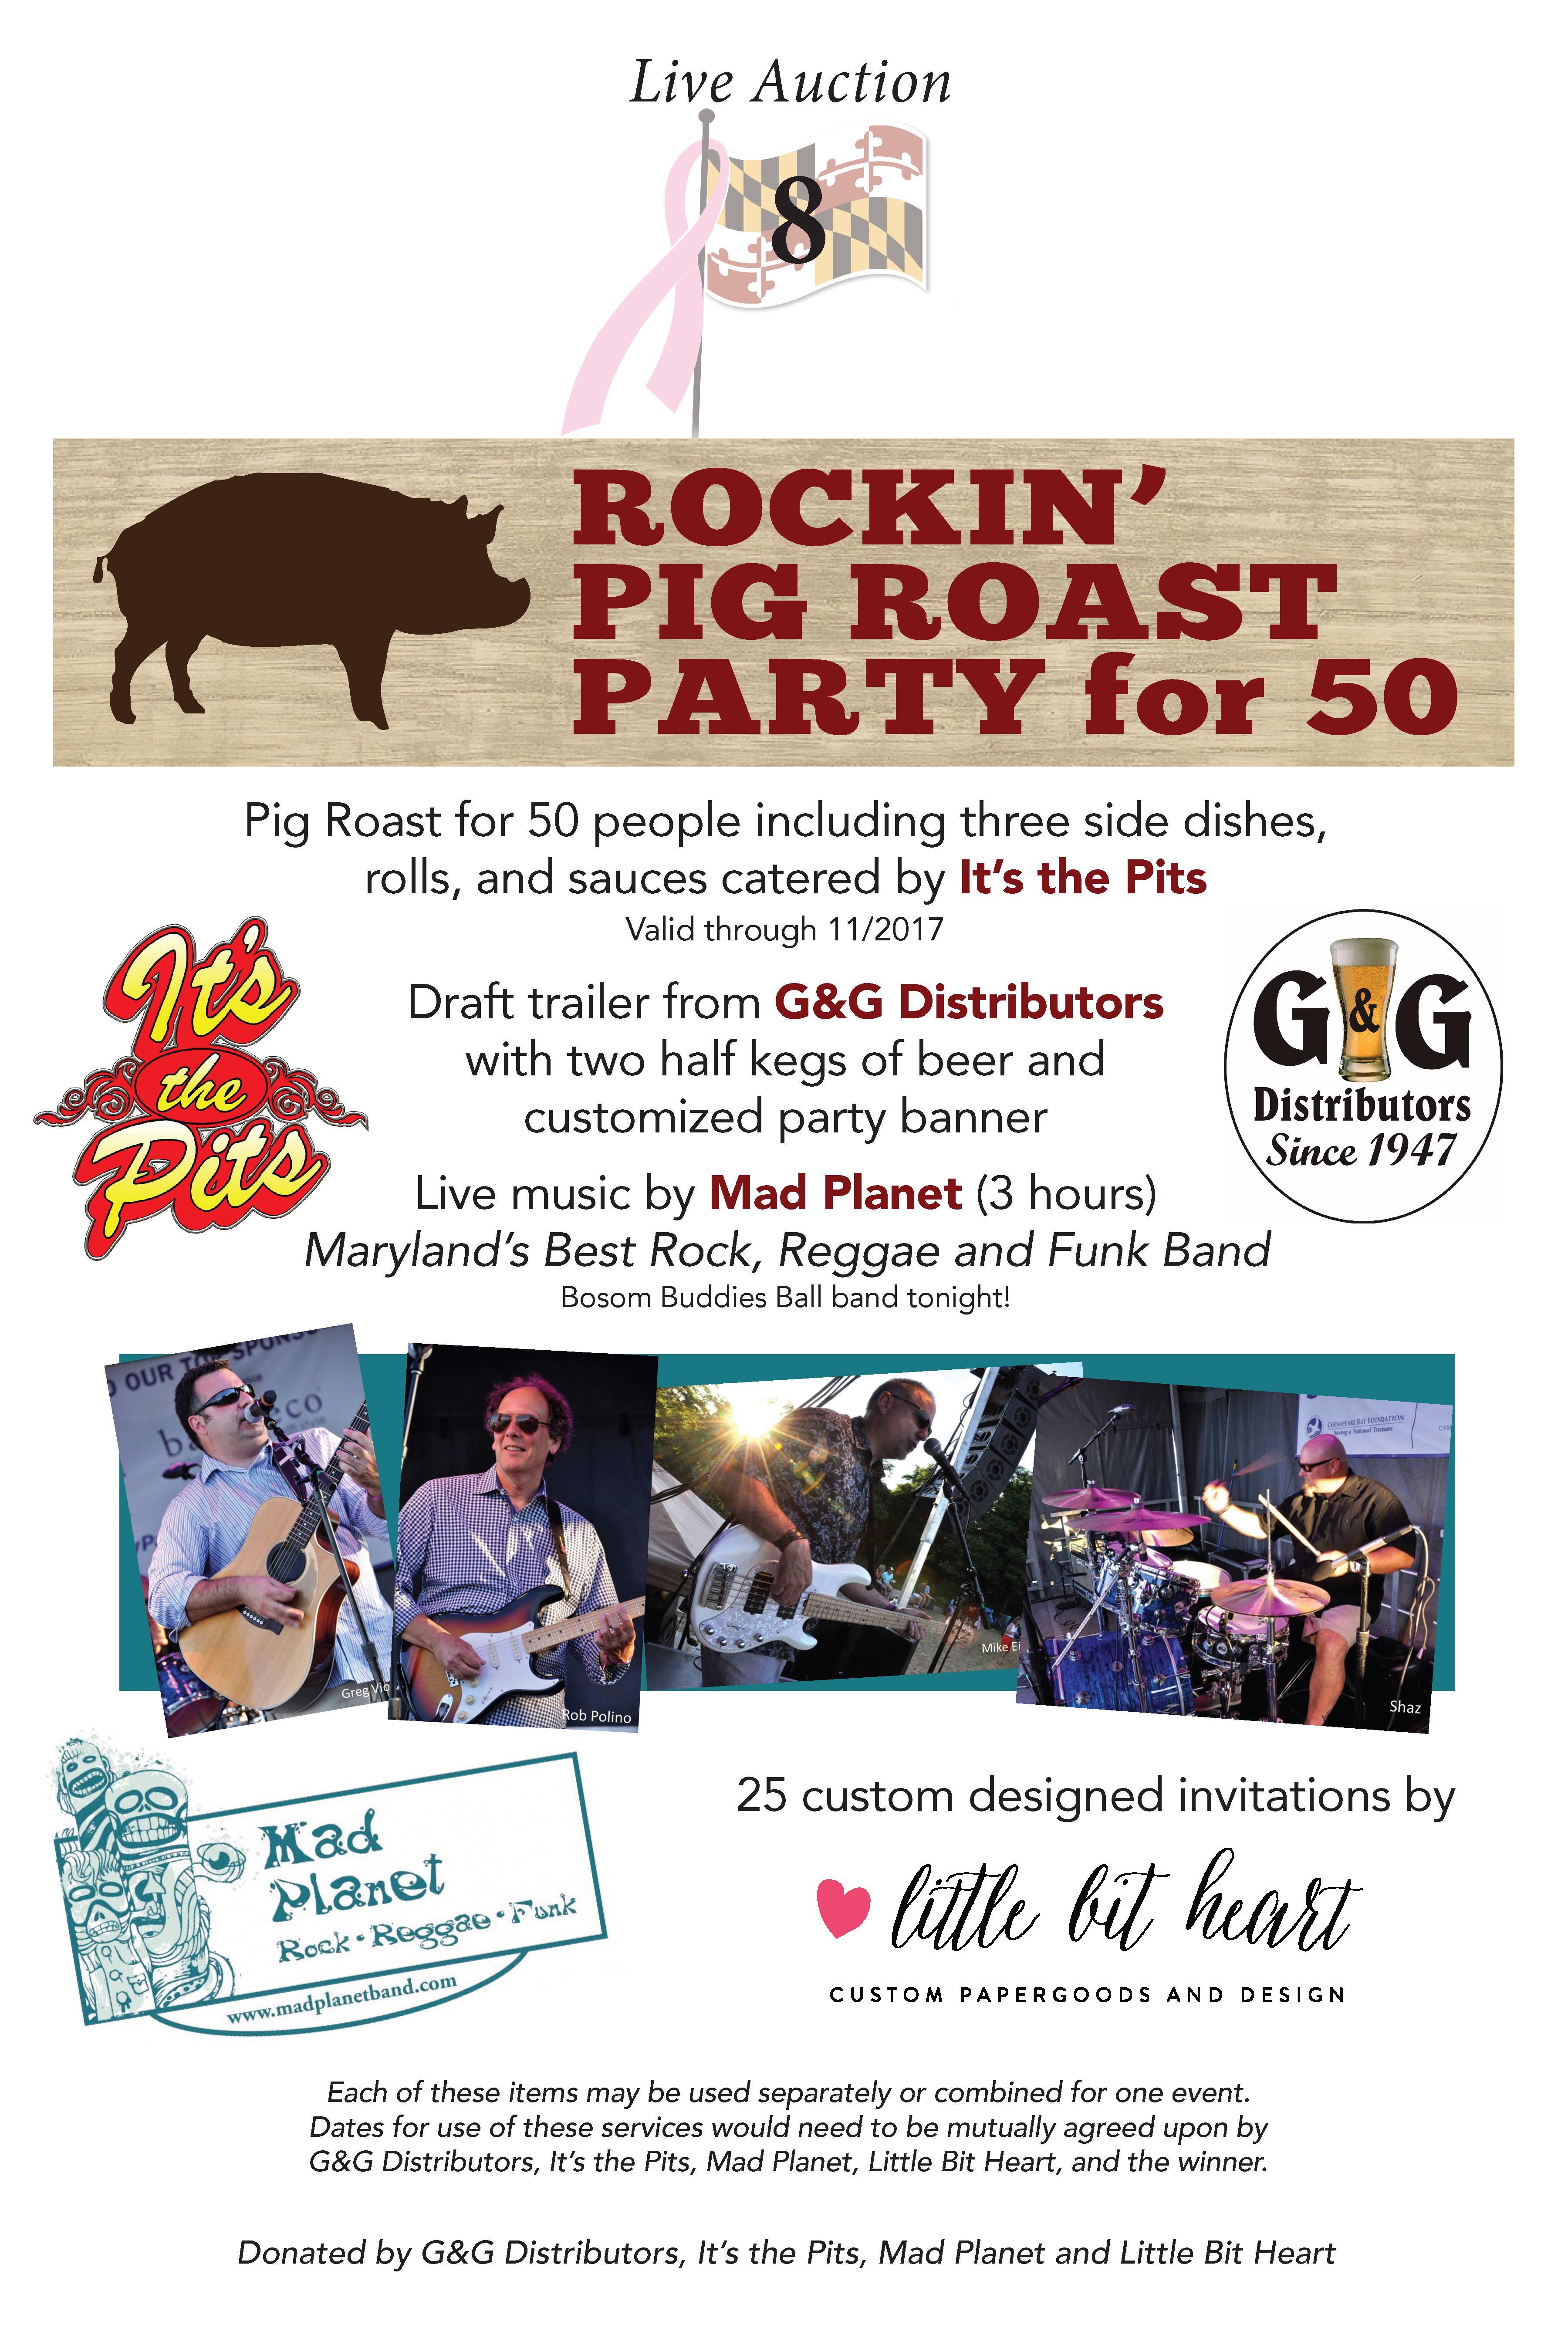 Rockin' Pig Roast Party